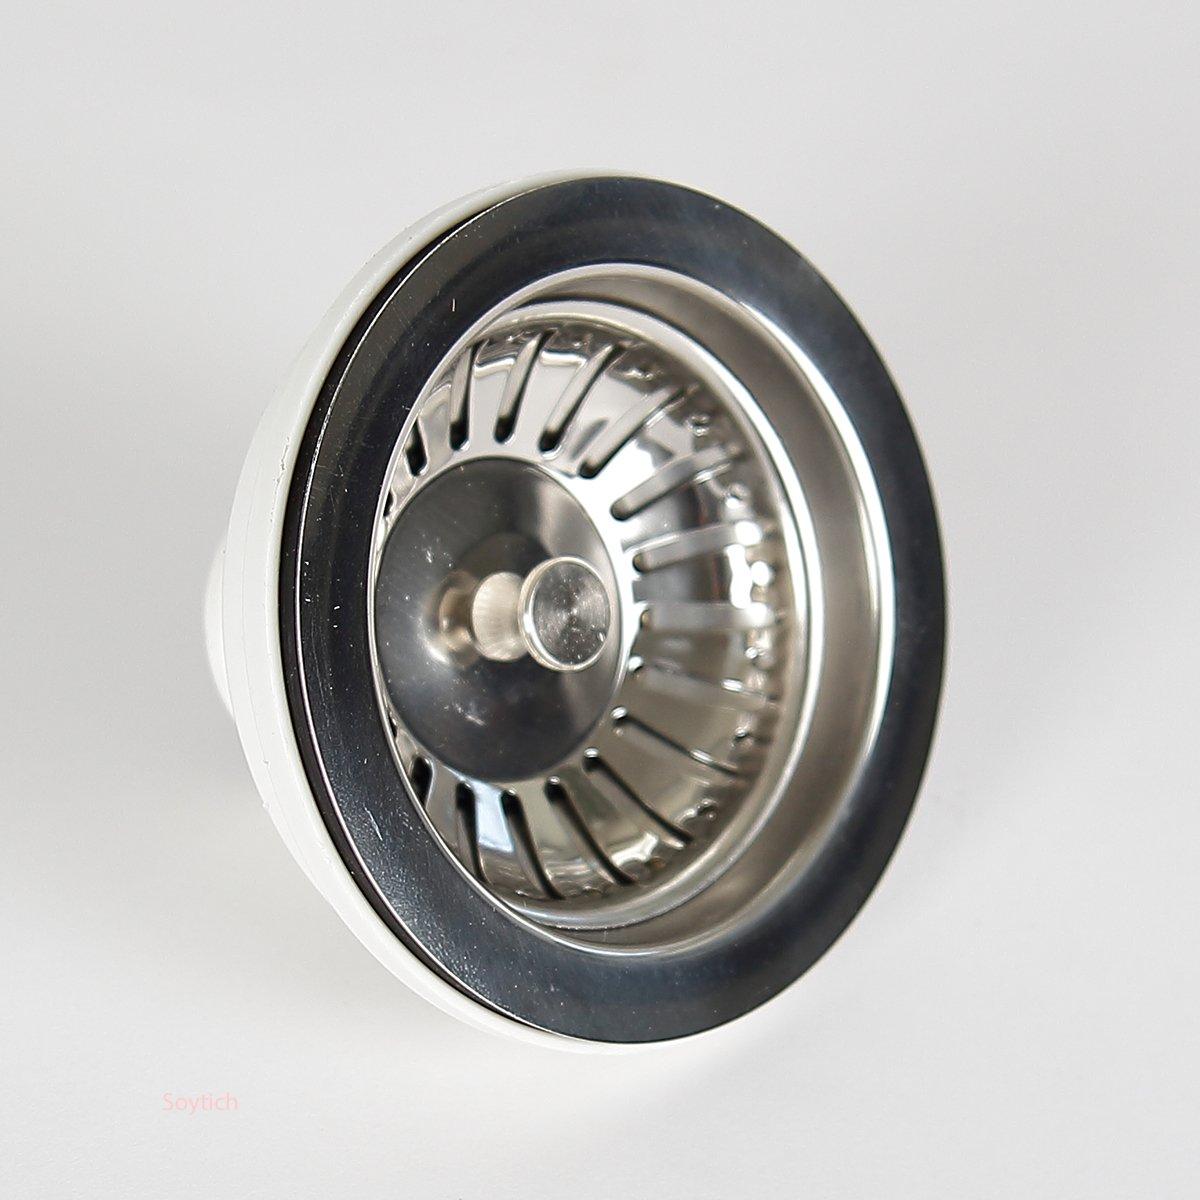 114 mm Abflusssieb Spülenablauf Spülen-Siebkorbventil 3 1//2 Zoll Siebkorb 02